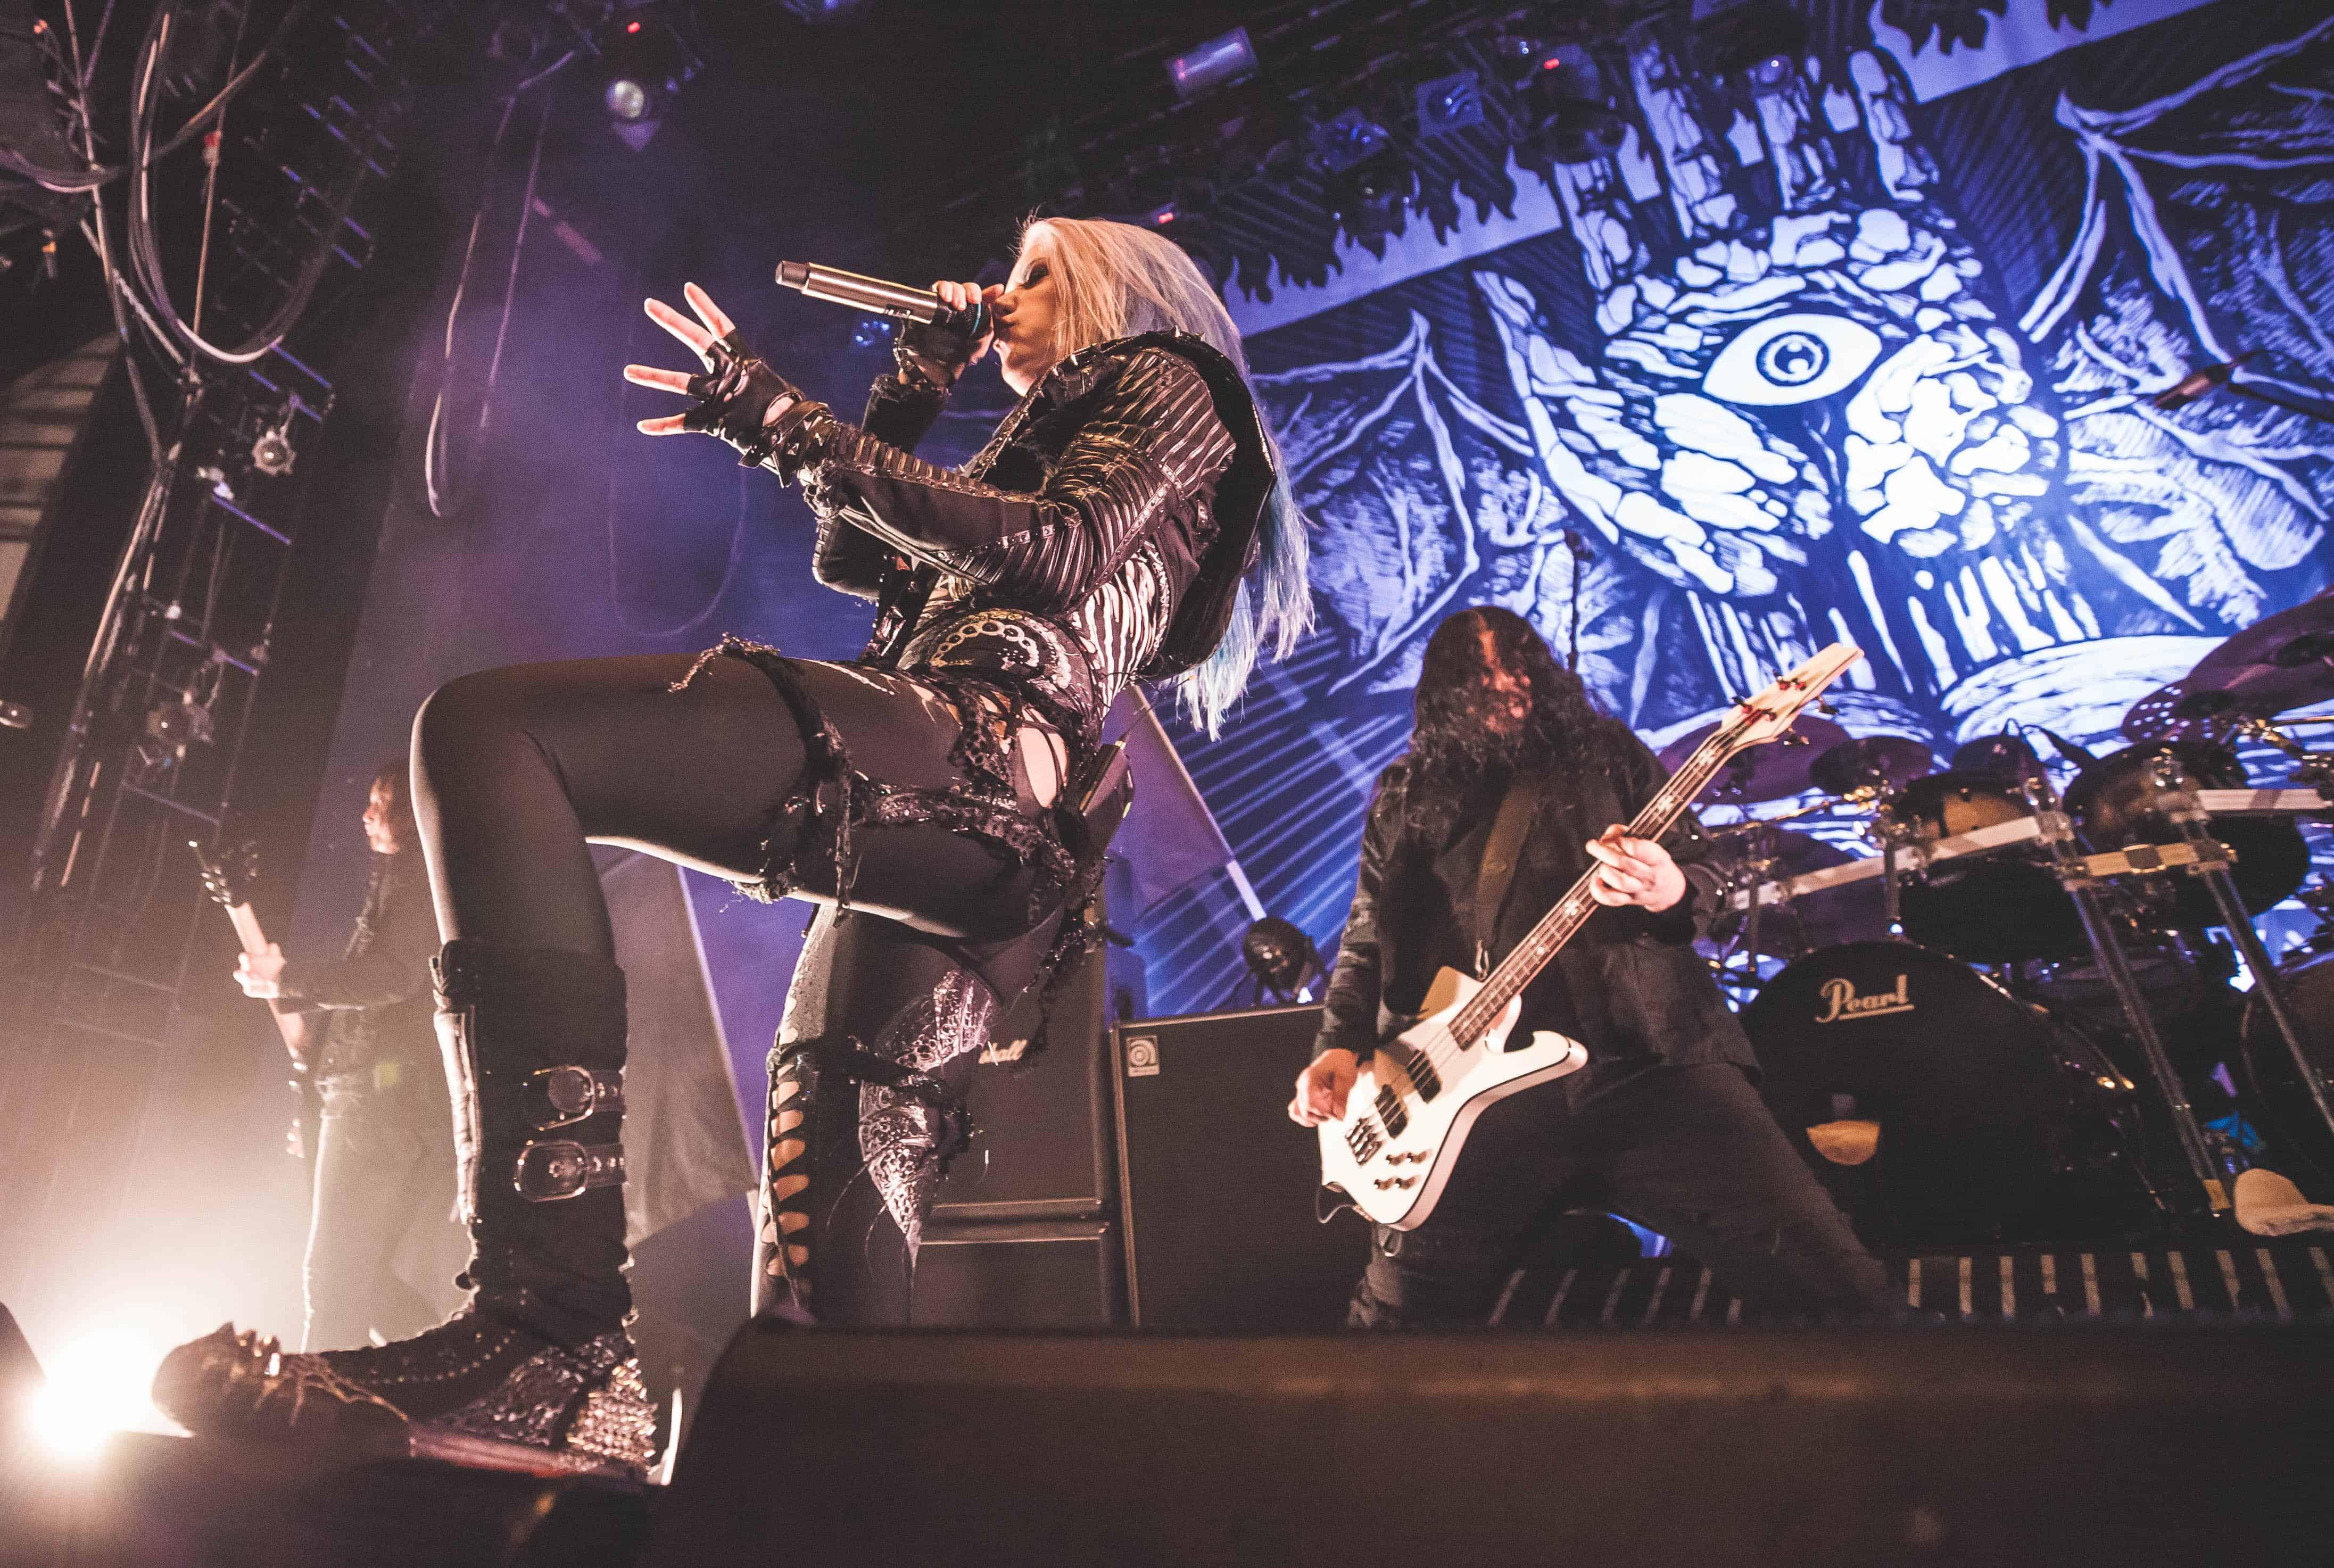 Photo of Концерт Arch Enemy в ГЛАВCLUB GREEN CONCERT Концерт Arch Enemy в ГЛАВCLUB GREEN CONCERT Концерт Arch Enemy в ГЛАВCLUB GREEN CONCERT IMG 6853